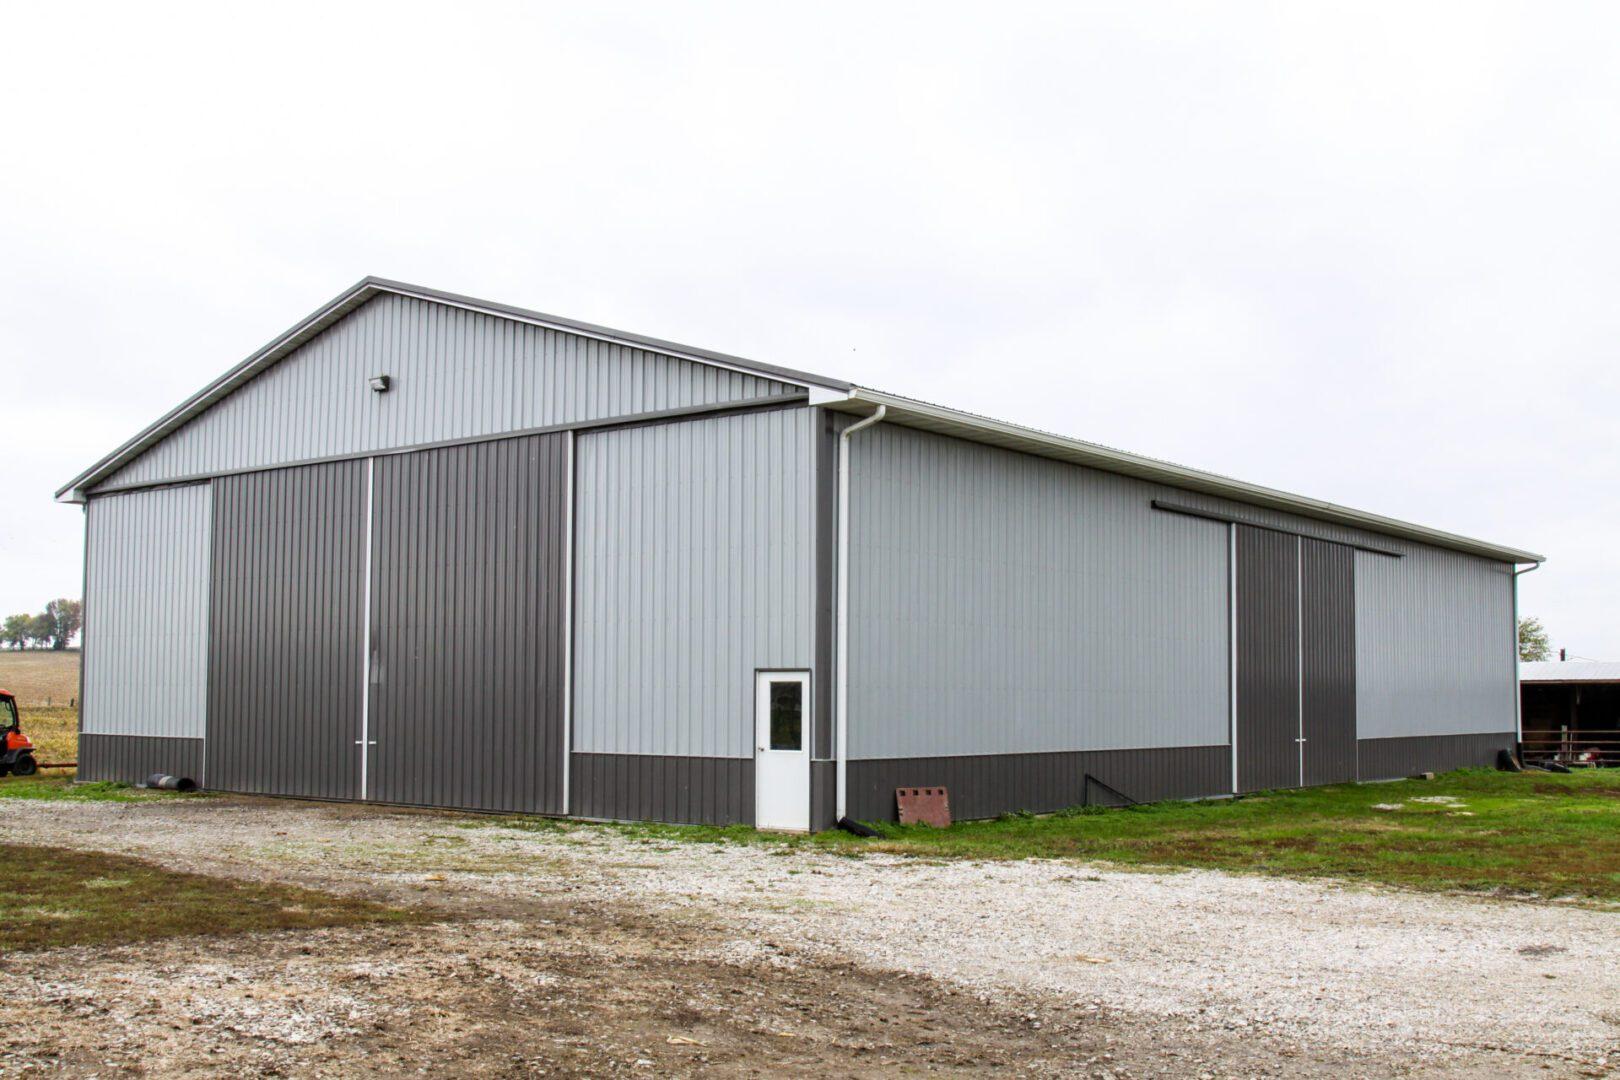 A steel barn